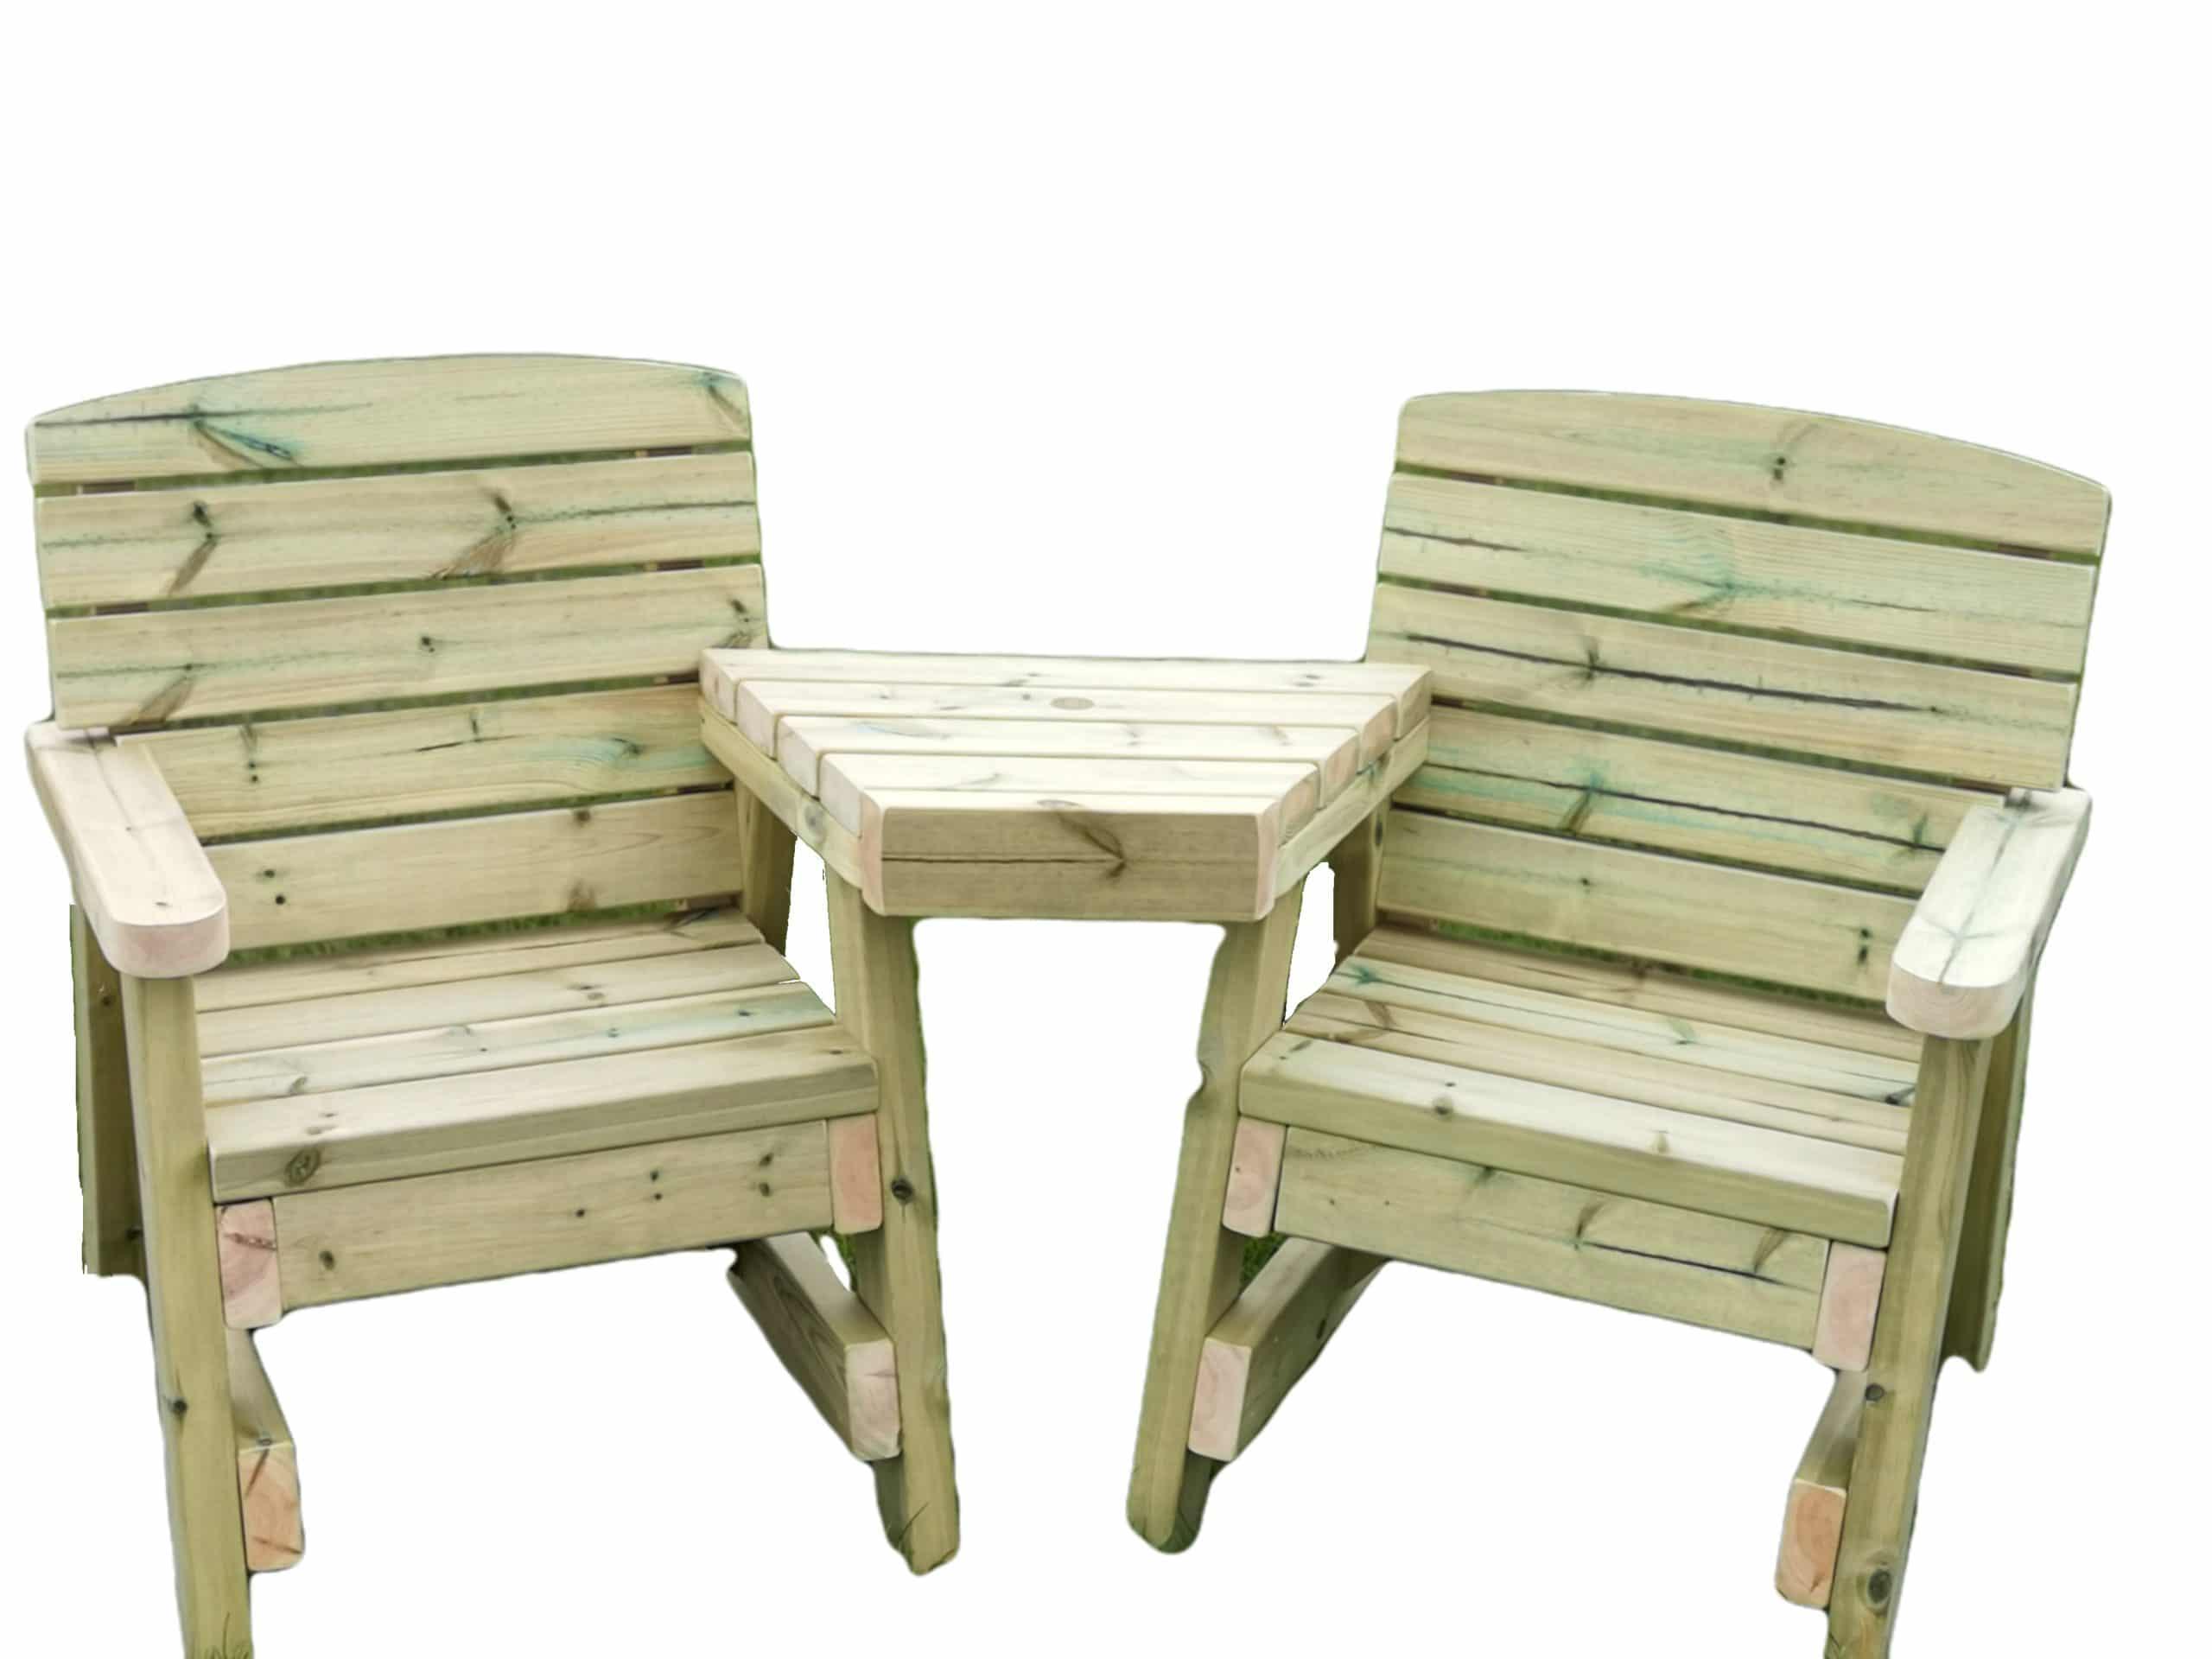 Wooden Love Seat Garden Love Seat Handmade In The Uk